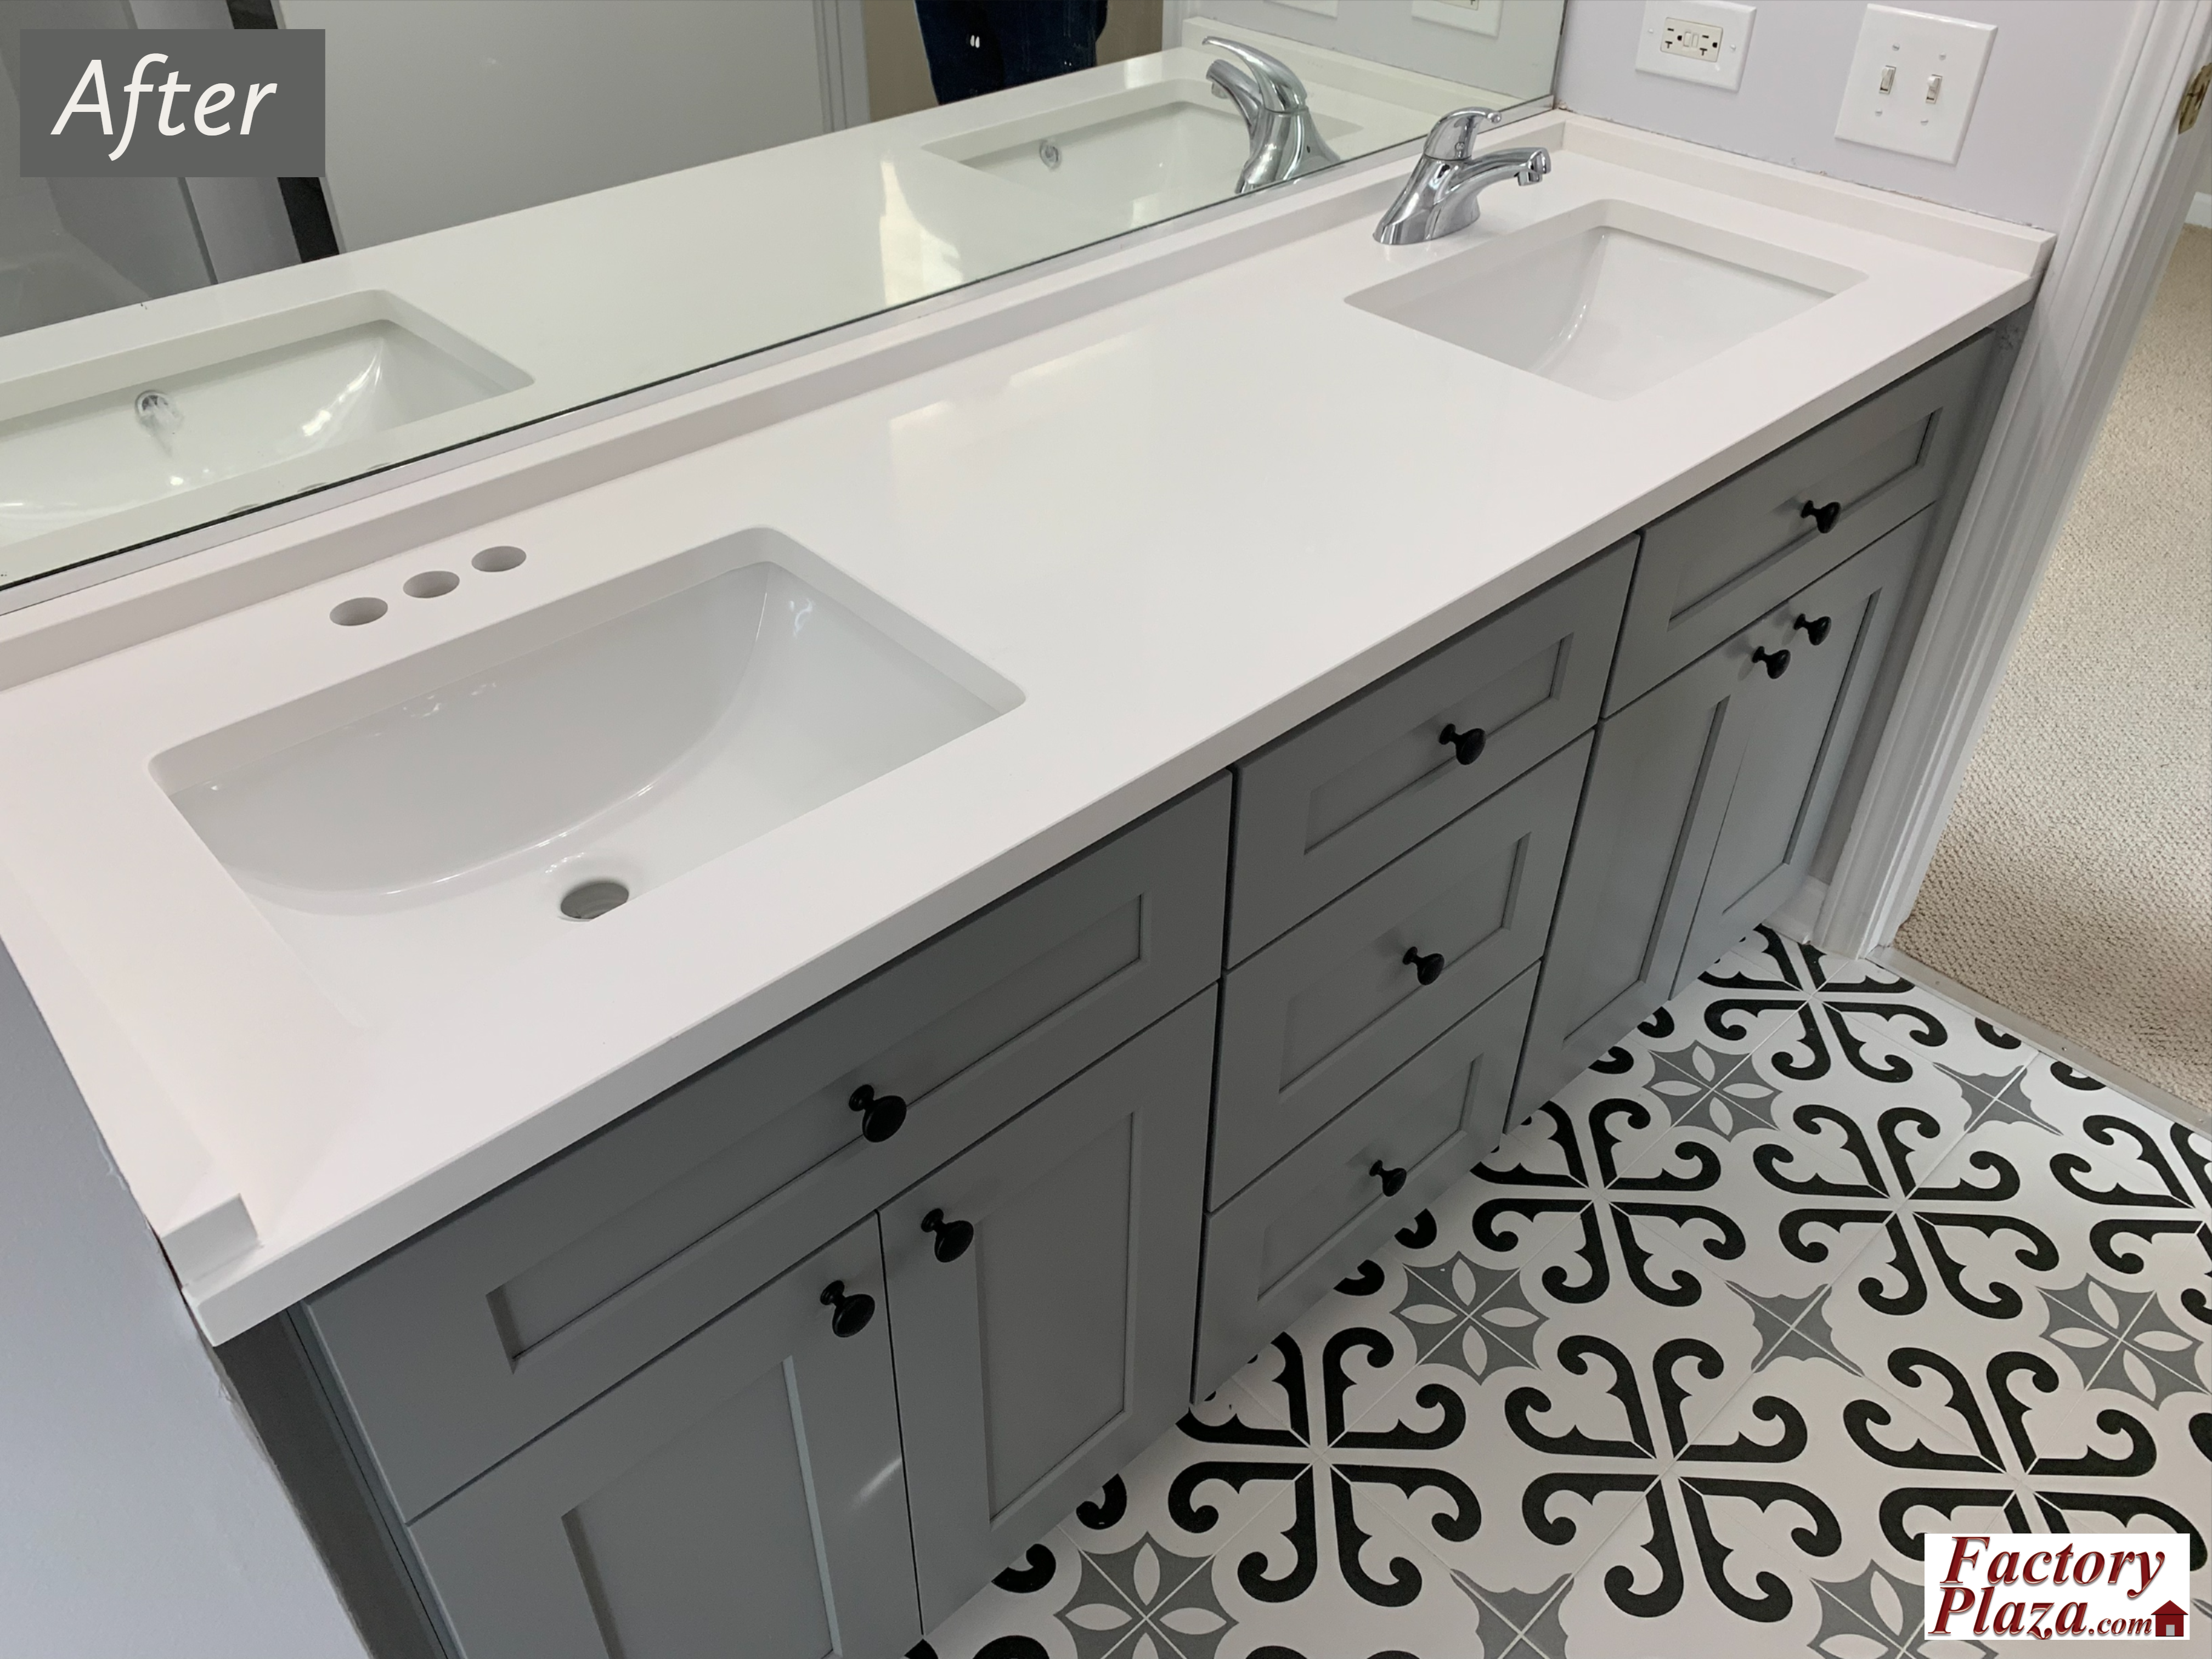 Bathroom Vanity Top Quartz Countertops Granite Quartz Countertops Kitchen Cabinets And Countertops